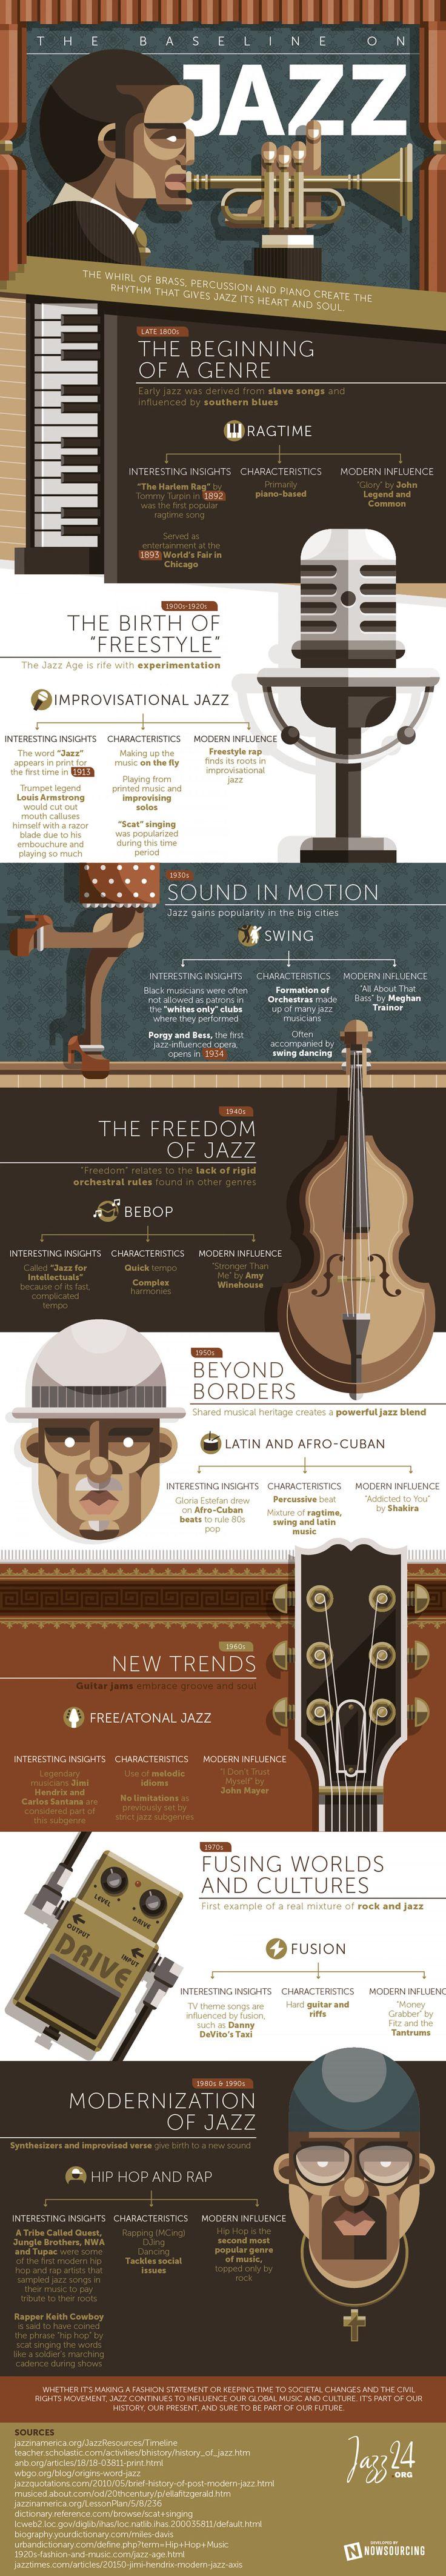 History Of Jazz - Music Infographic